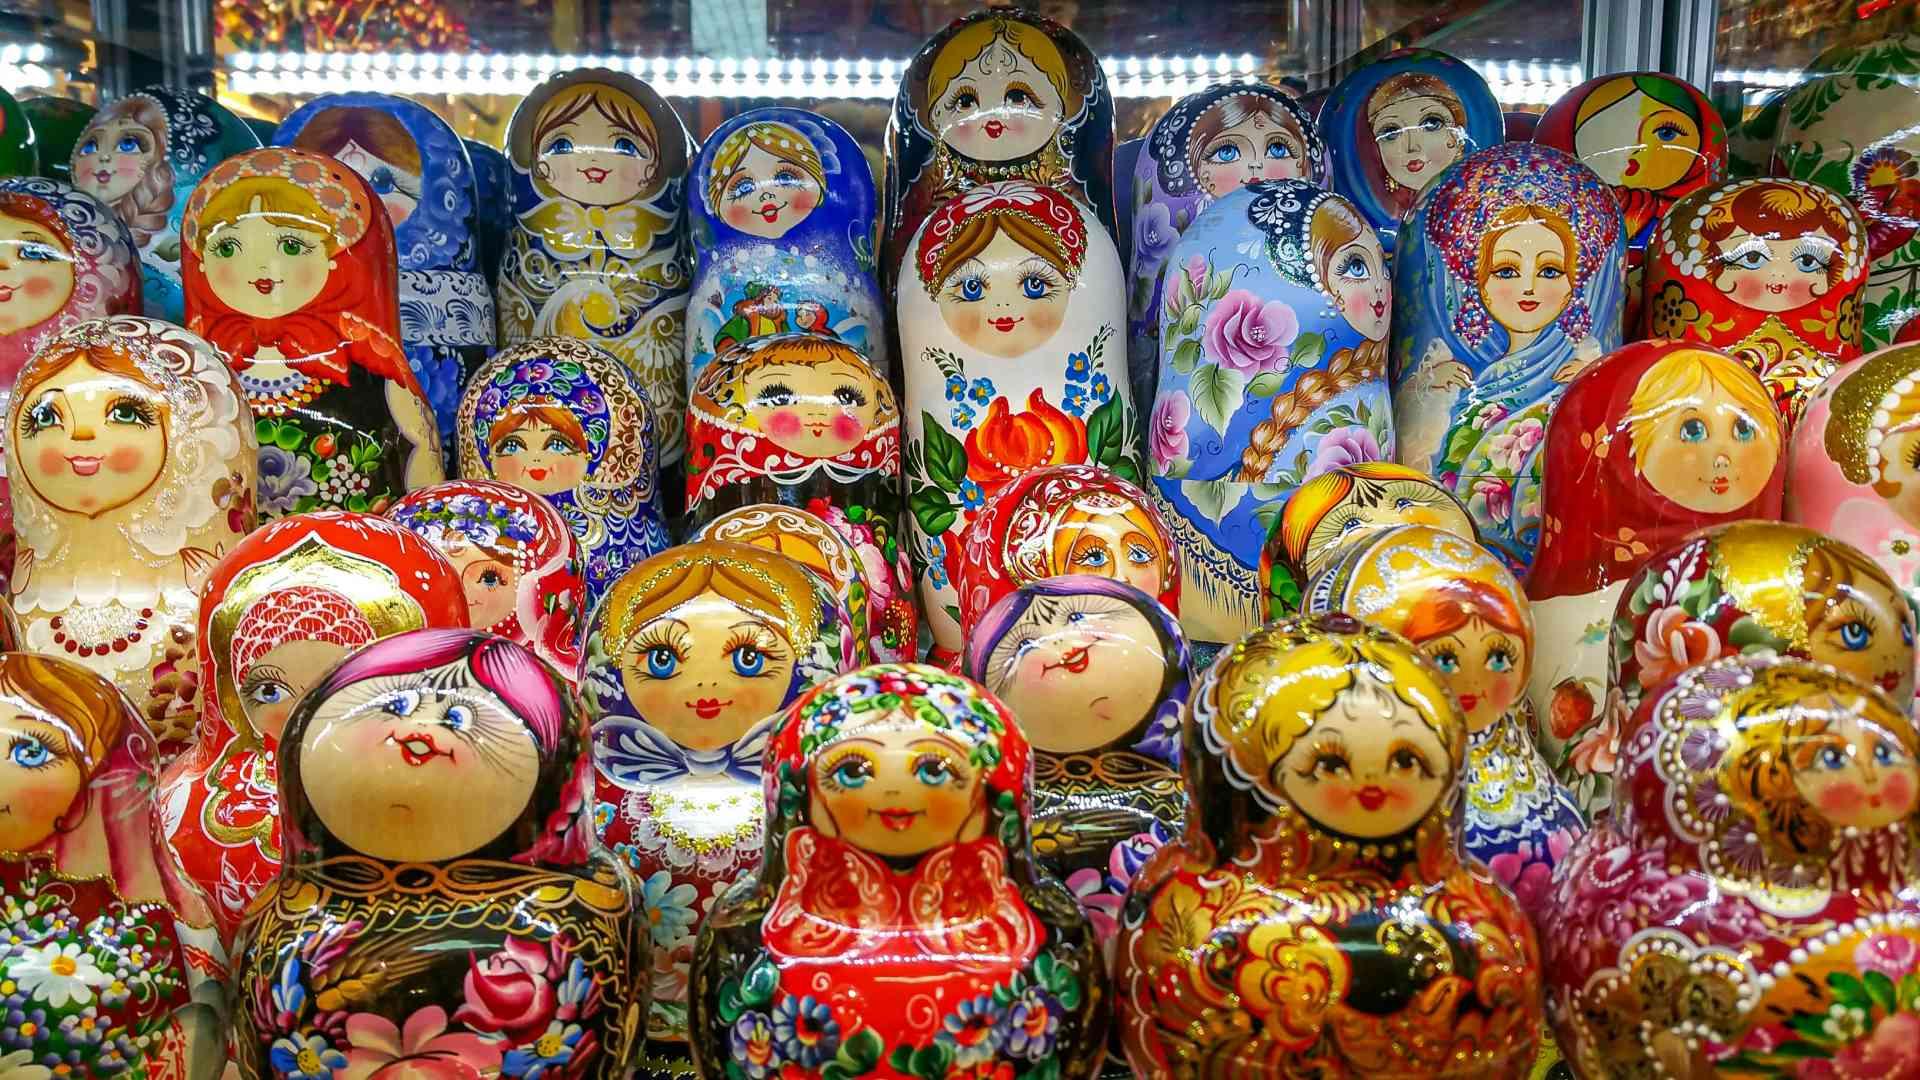 Matryoshka Dolls, Russia by Chloe Marshman